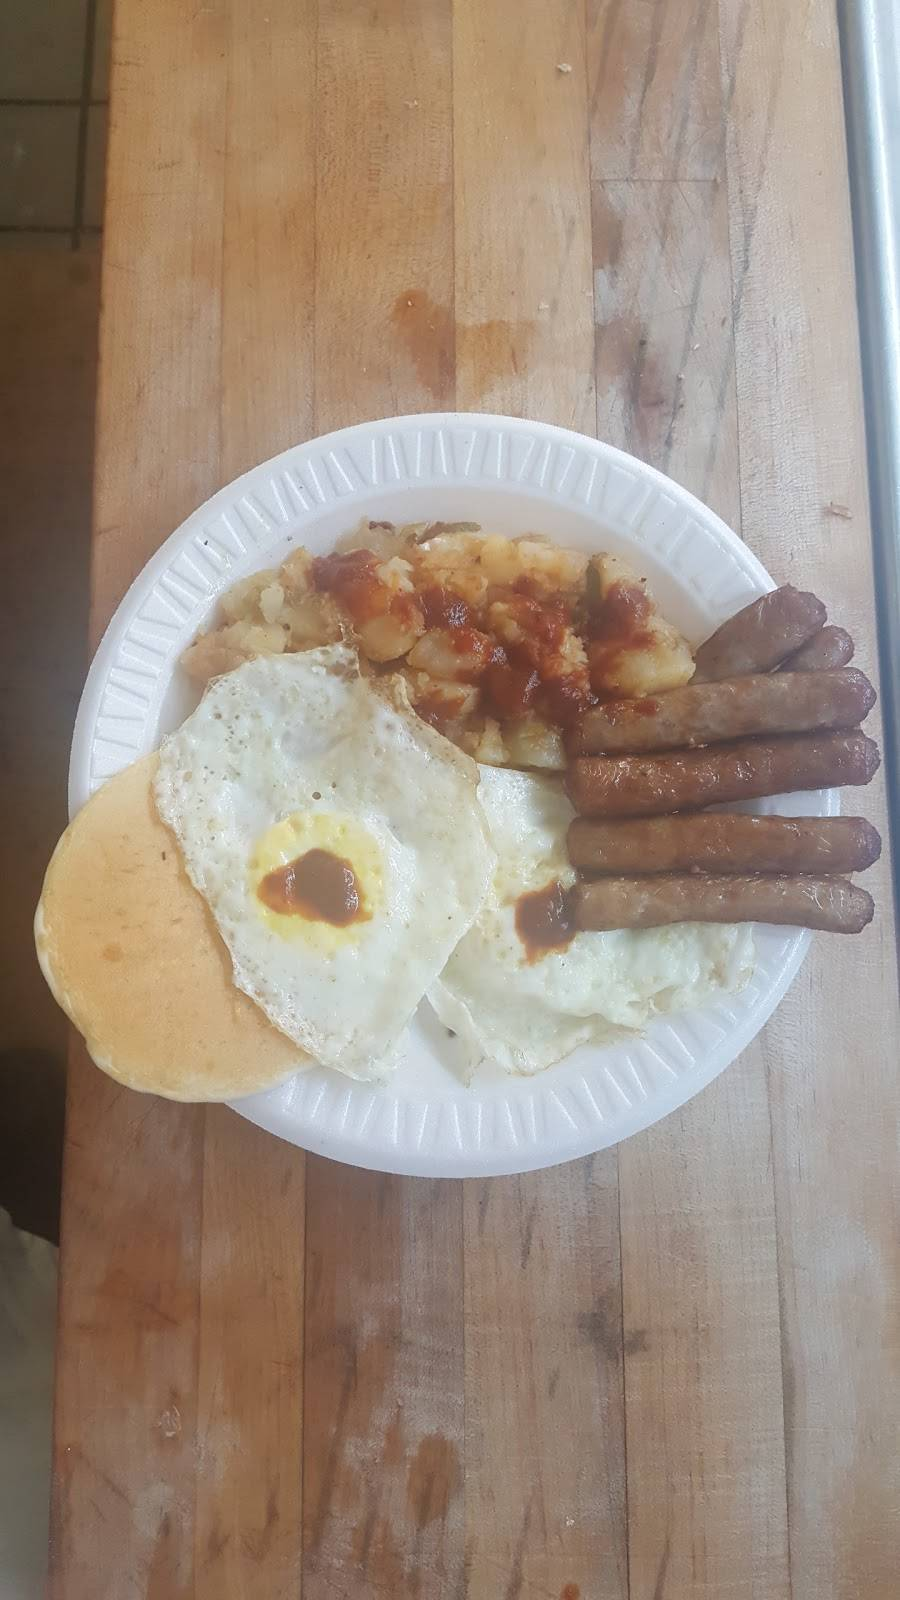 Hunter Delicatessen | meal takeaway | 966 Lexington Ave # 1, New York, NY 10021, USA | 2124397758 OR +1 212-439-7758